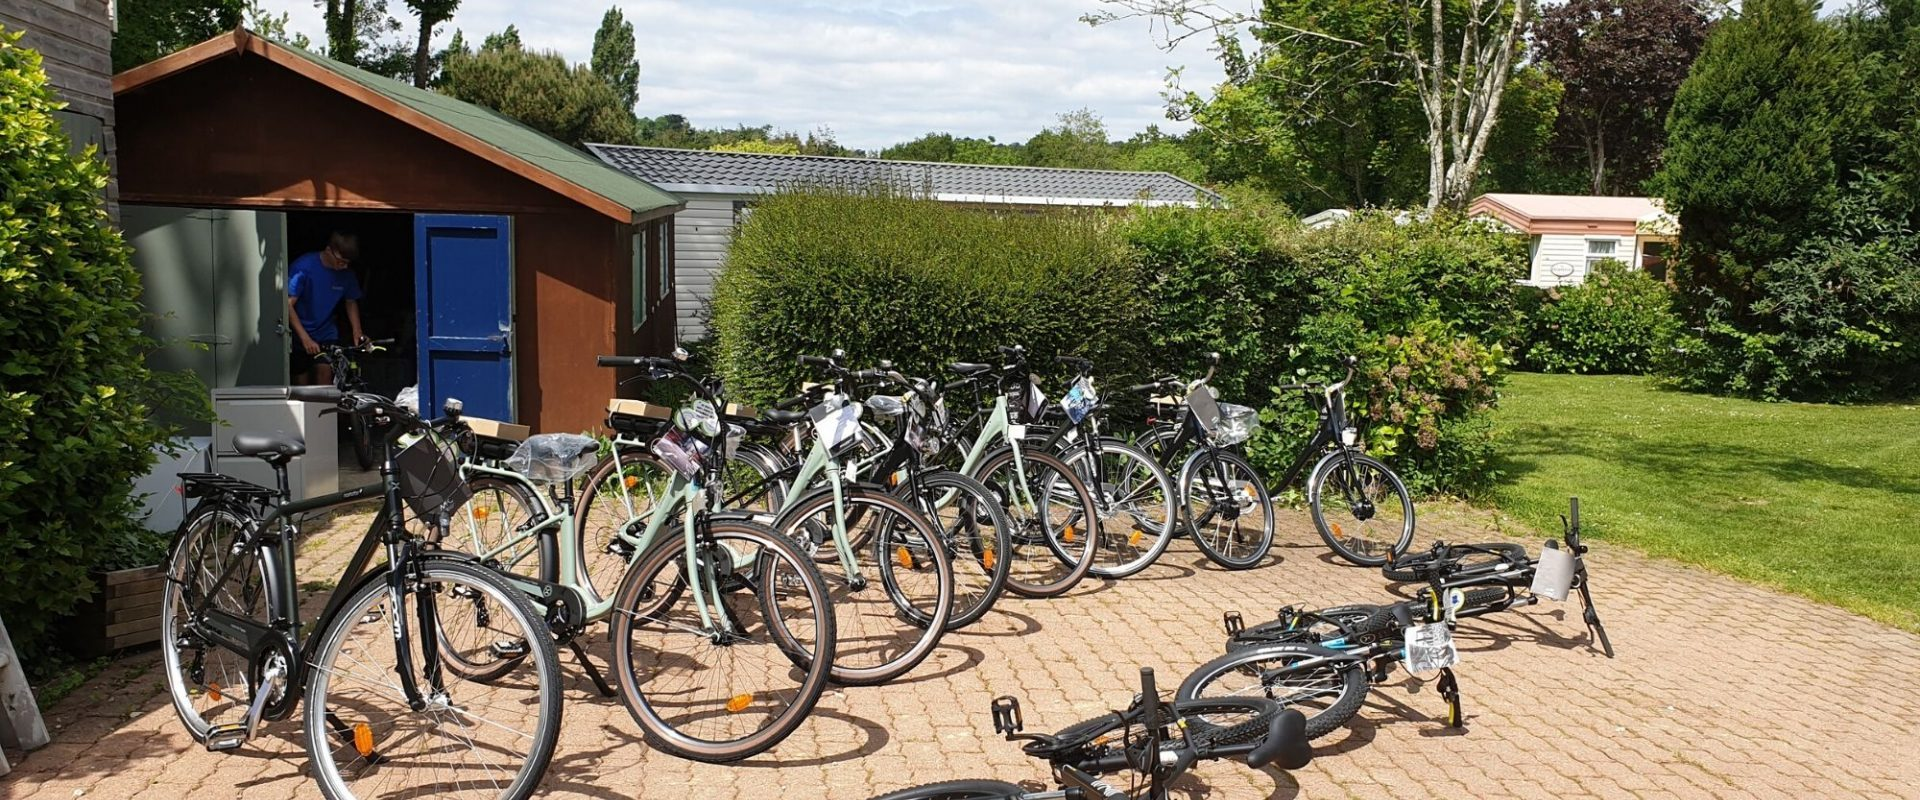 Clohars Carnoet Location Vélo Camping Du Quinquis